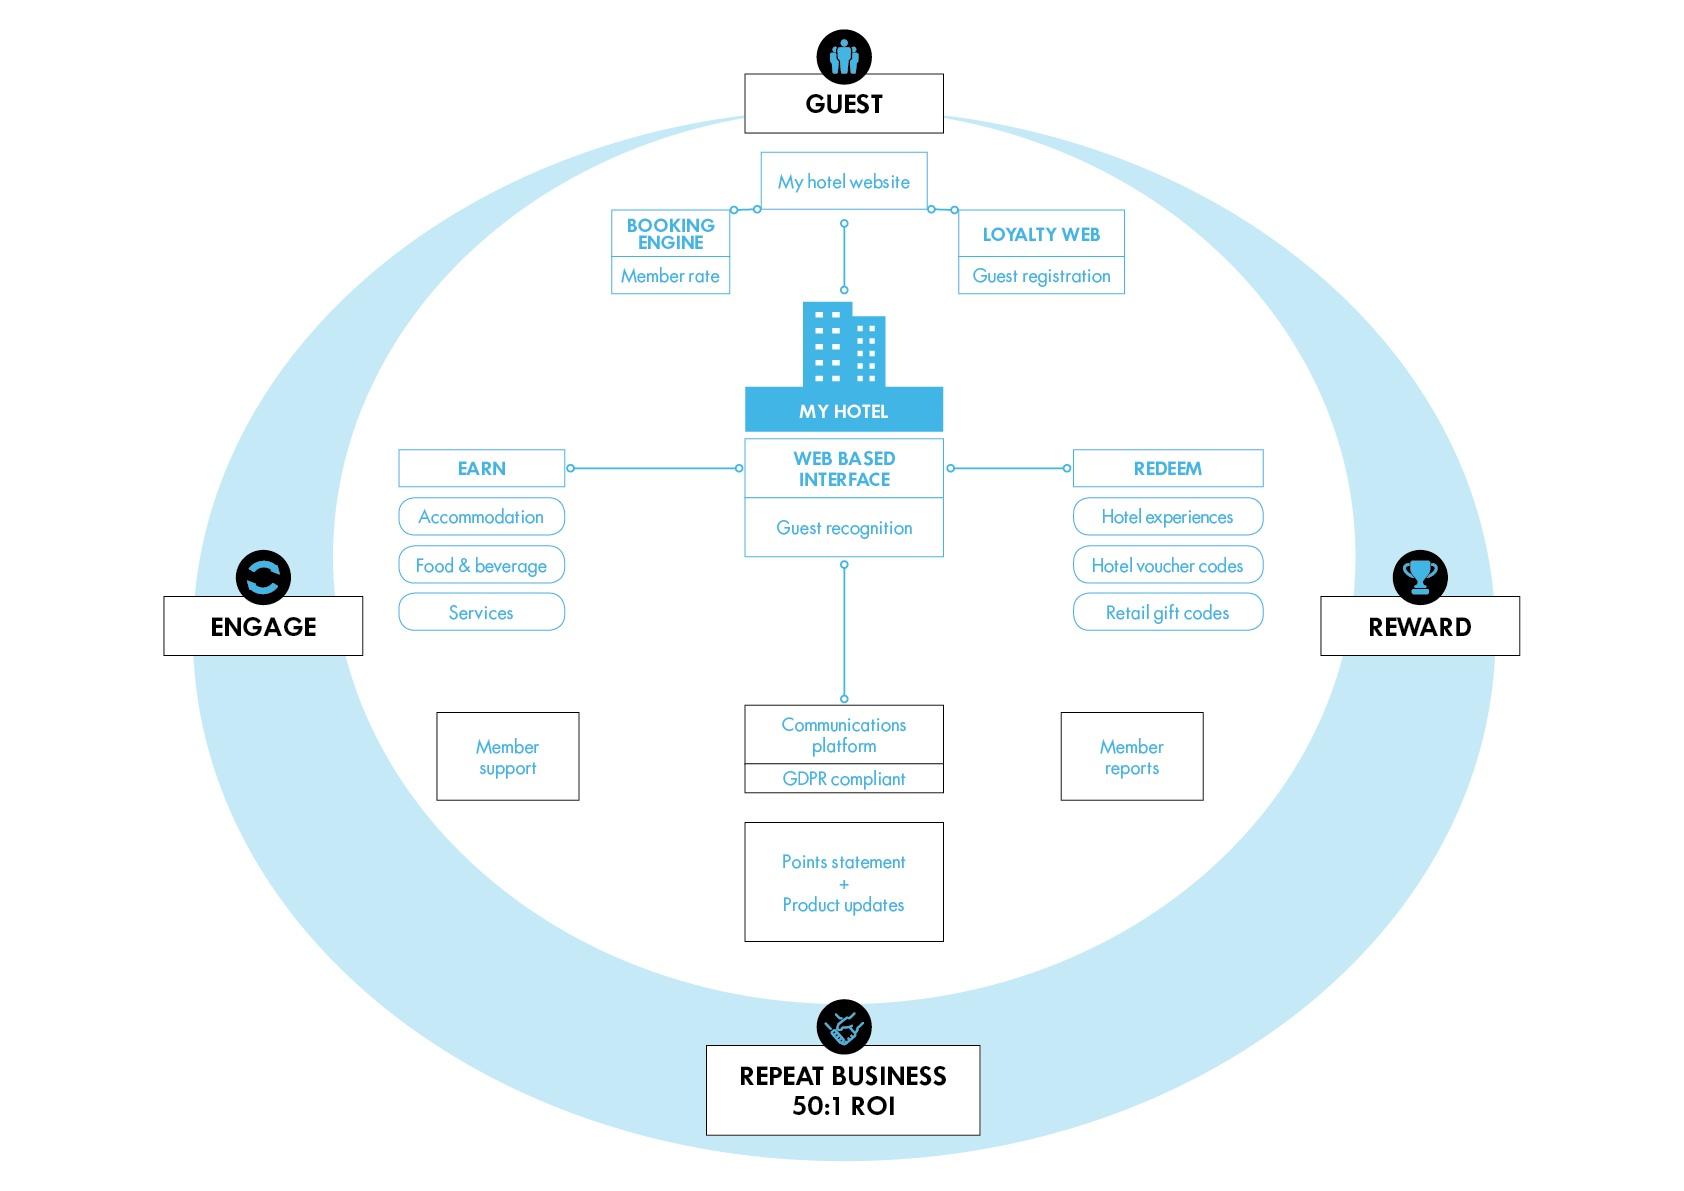 Inspire loyalty process diagram